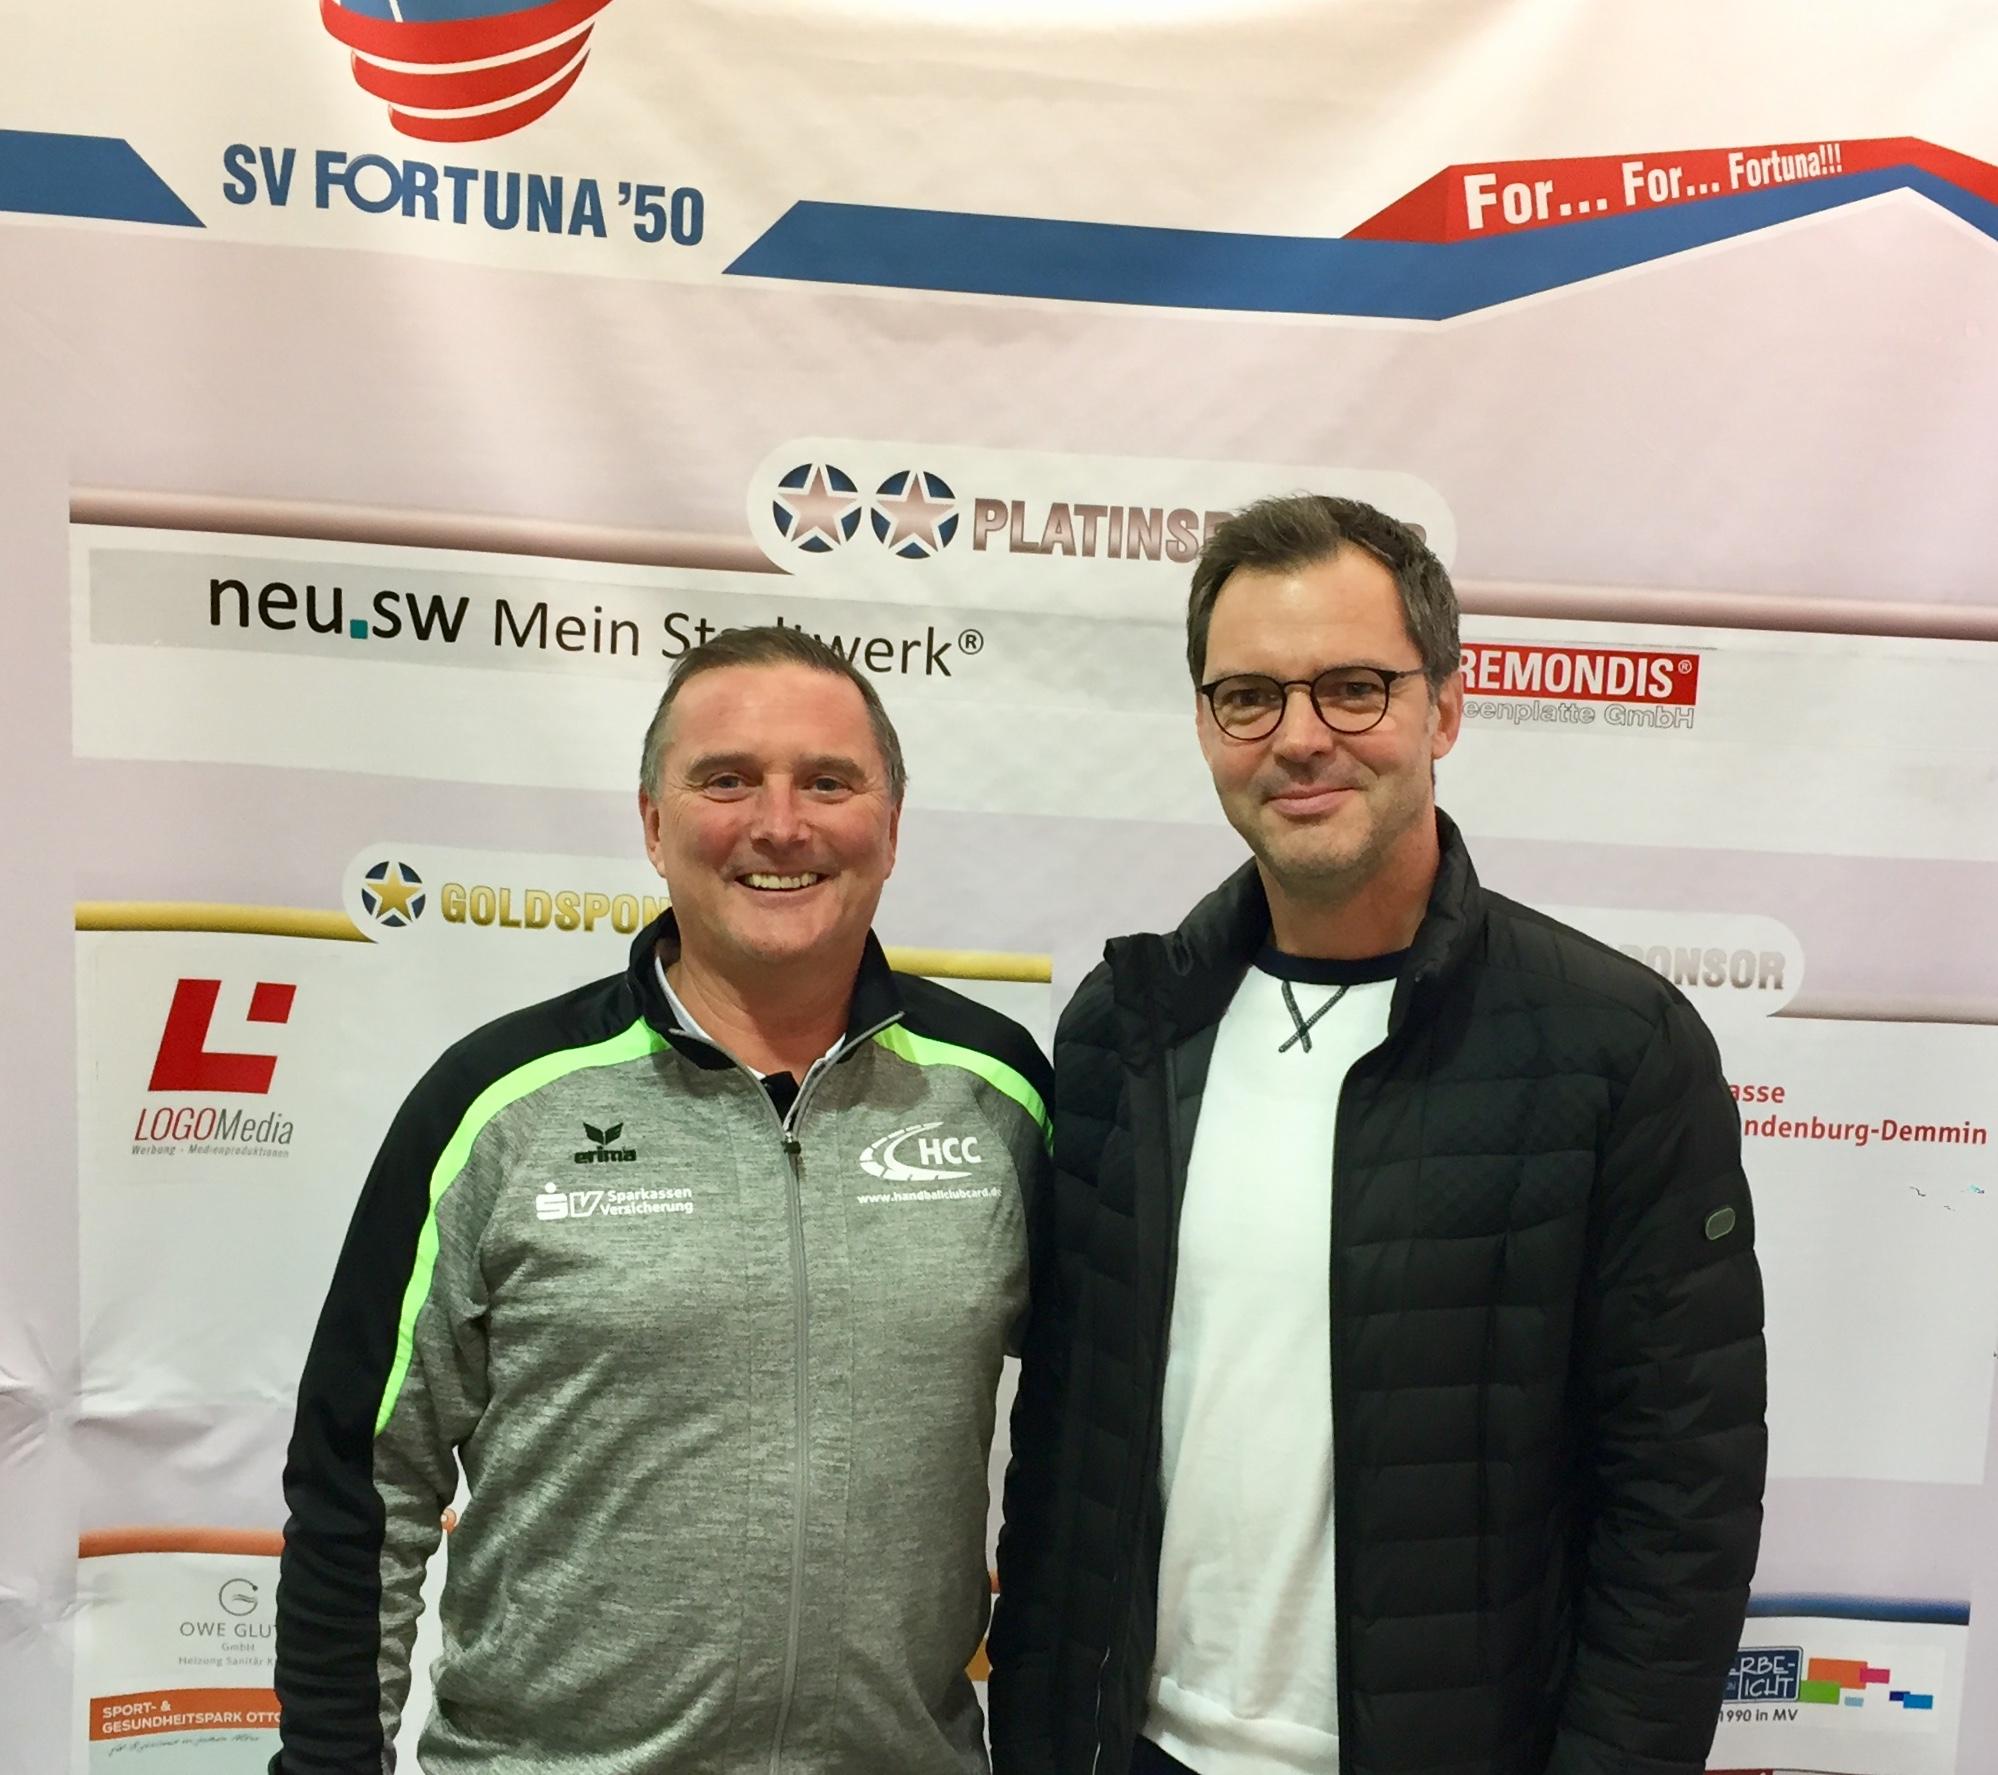 Startseite - SV Fortuna ´50 Neubrandenburg